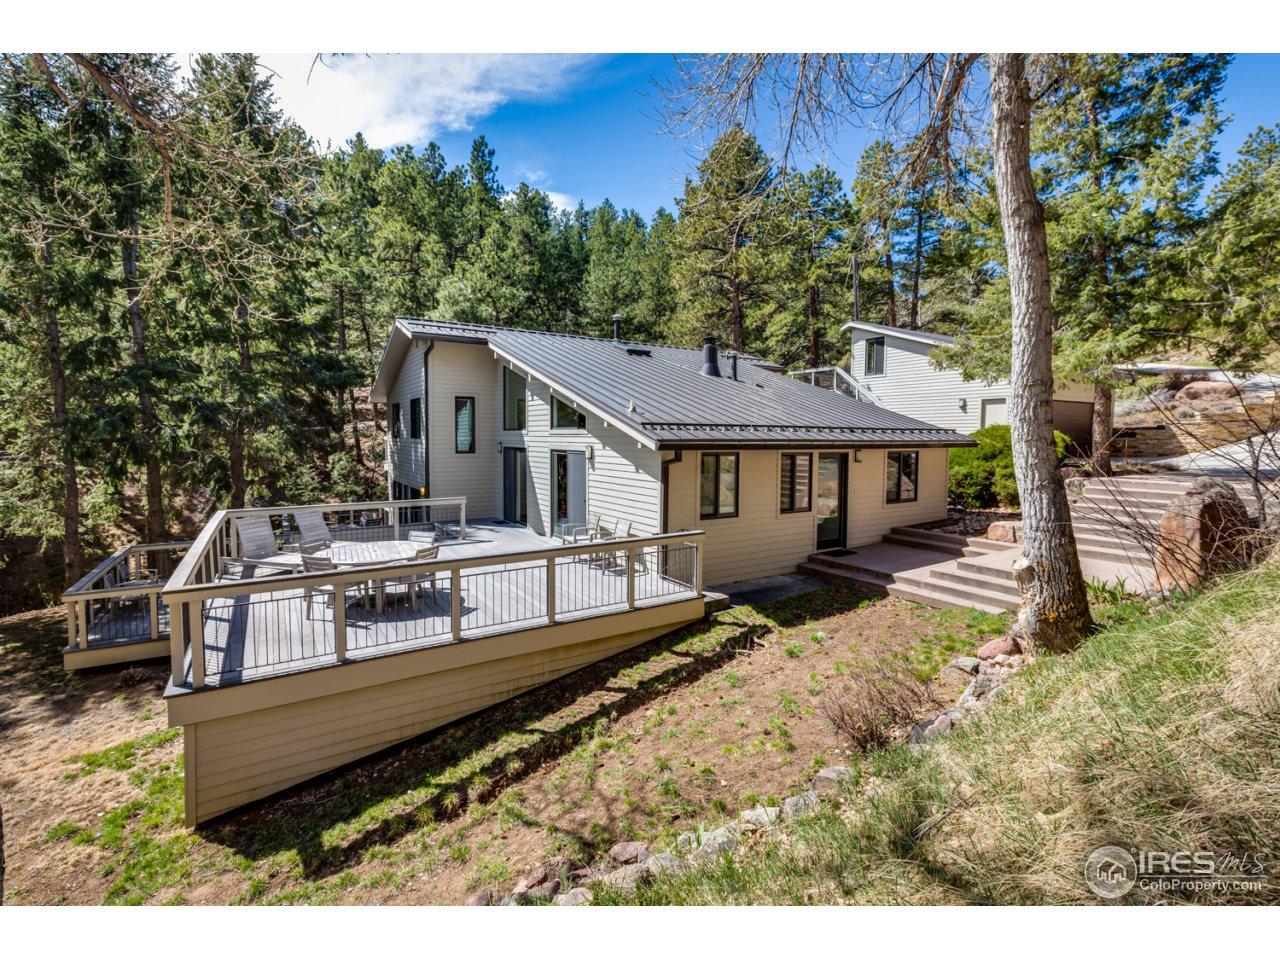 1942 Timber Ln, Boulder CO 80304